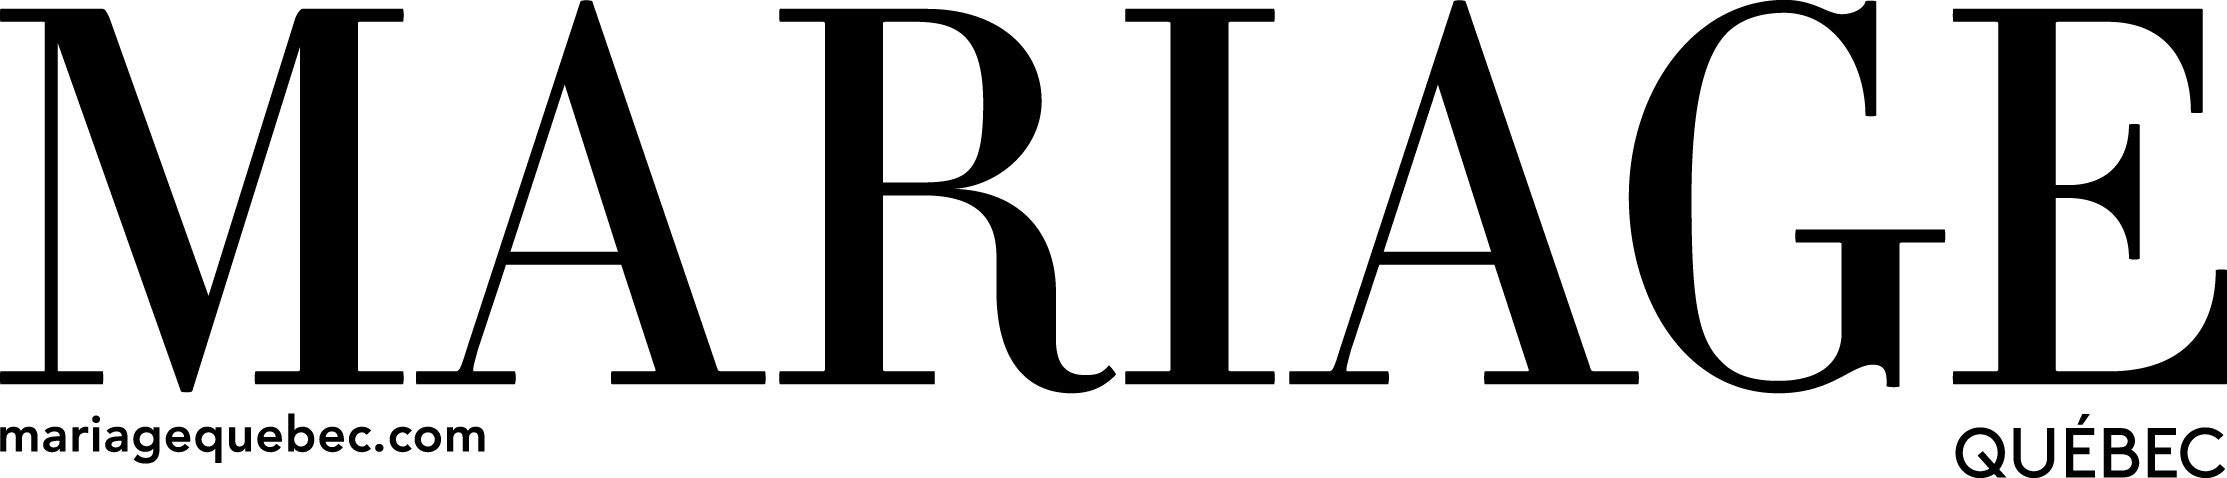 logo mariage qc 2013